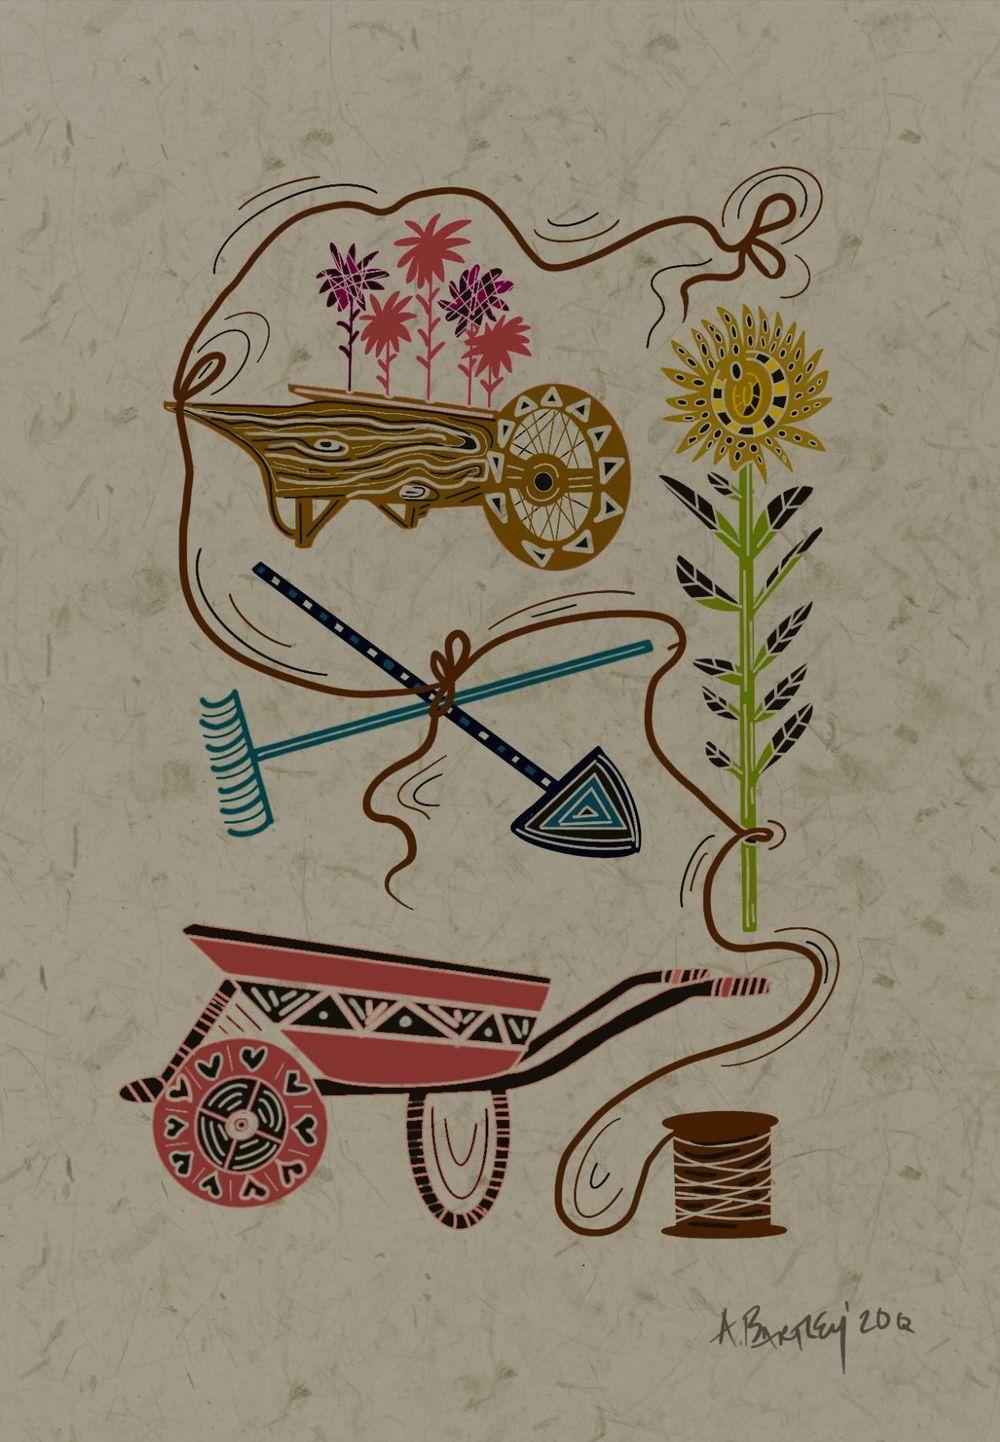 Folk Art Illustration ideas - image 2 - student project